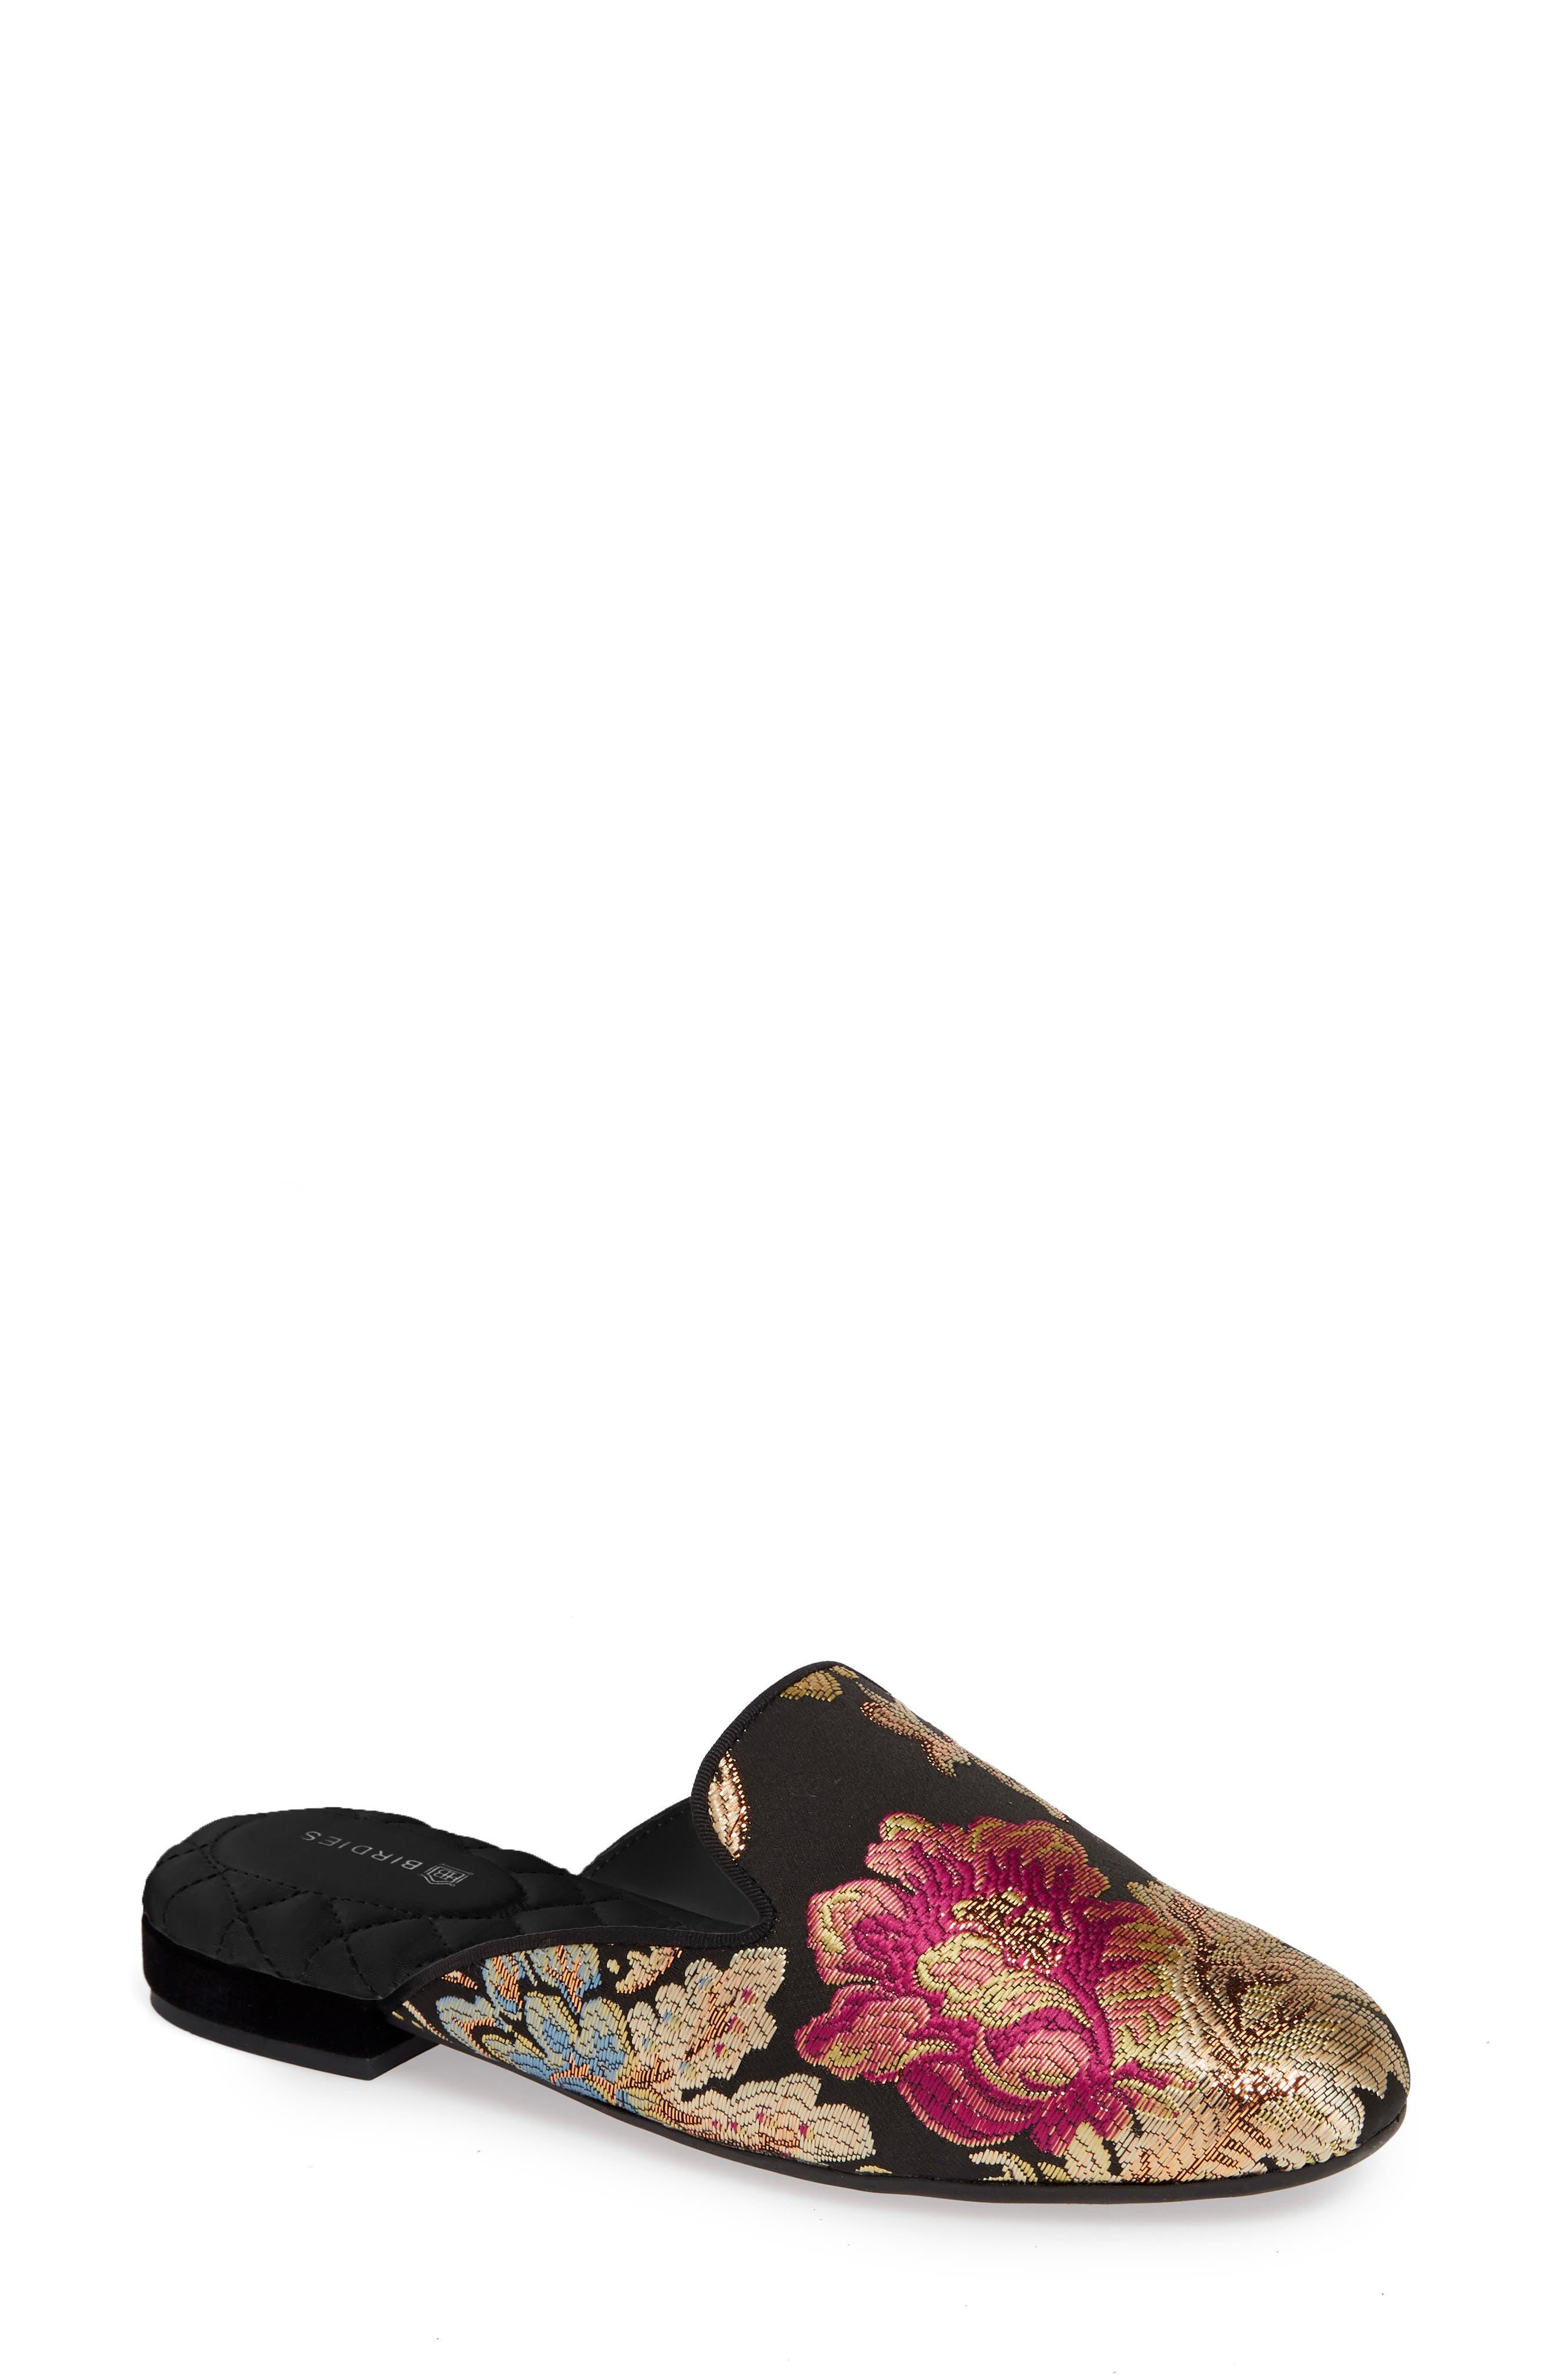 BIRDIES Phoebe Slipper, Main, color, FLORAL JACQUARD SATIN